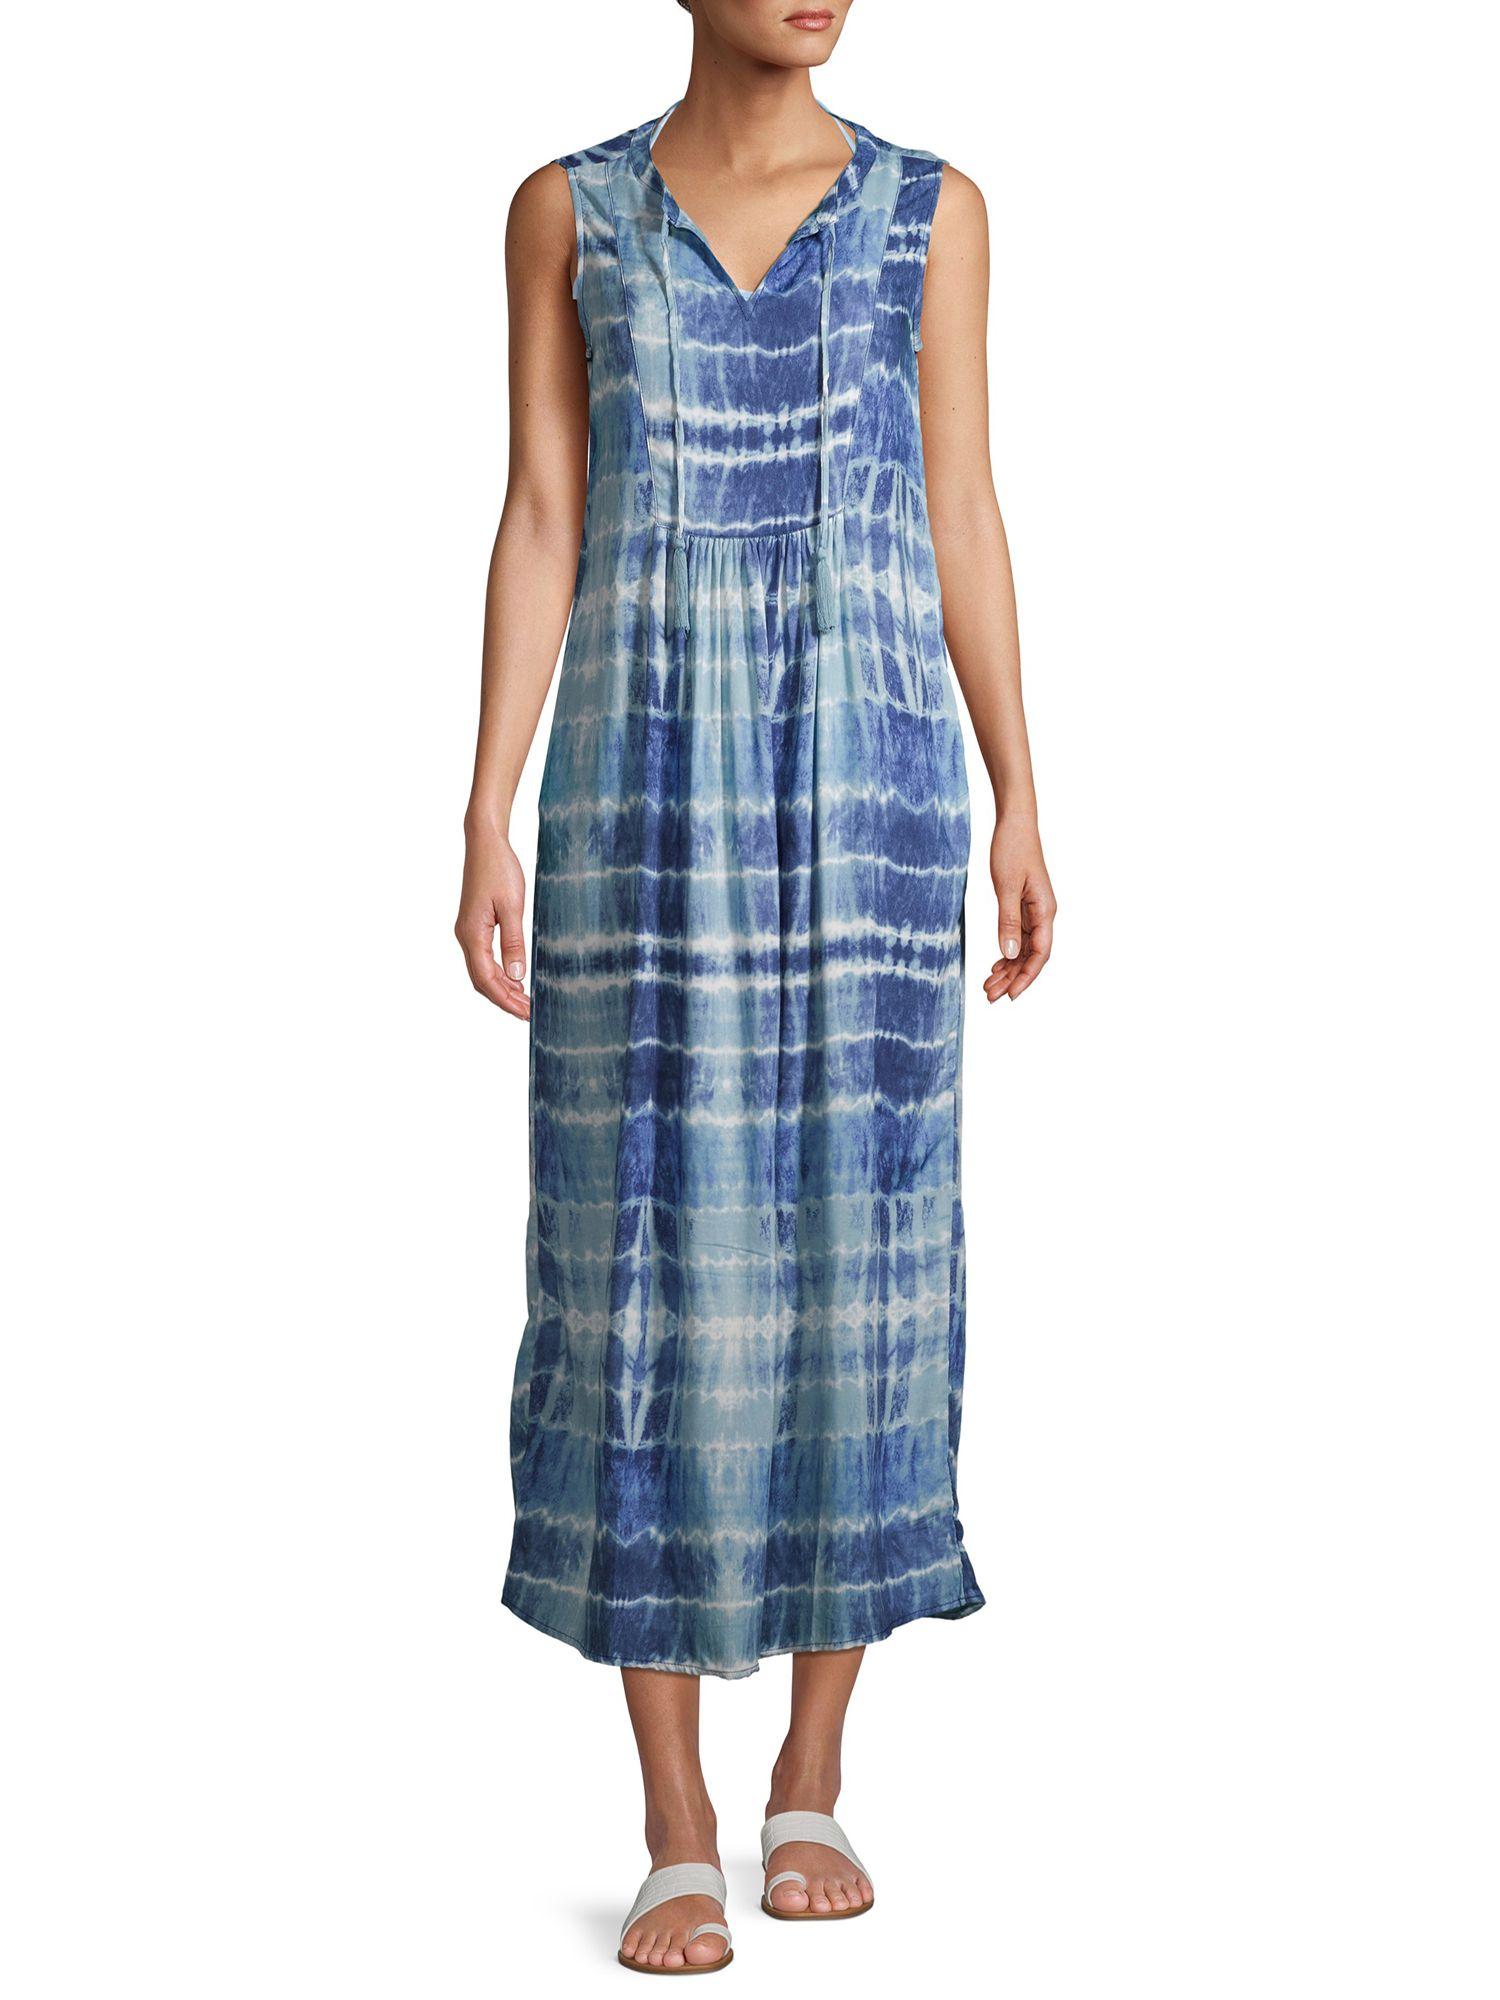 Beachlunchlounge Beachlunchlounge Kamarin Sleeveless Maxi Dress Walmart Com Buy Maxi Dress Maxi Dress Sleeveless Maxi Dress [ 2000 x 1500 Pixel ]